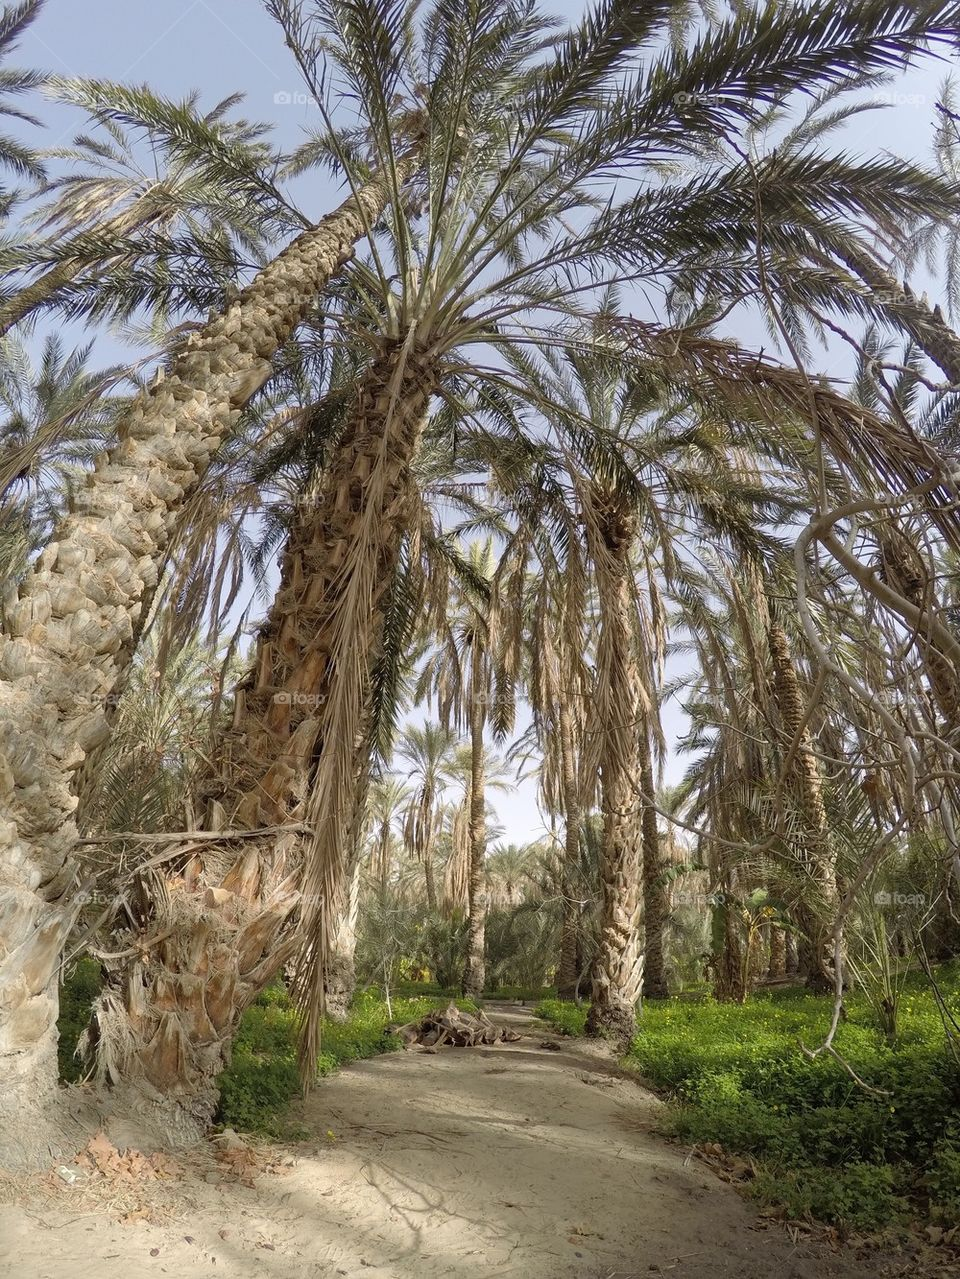 Date palm trees in a desert in a desert oasis in Tunisia